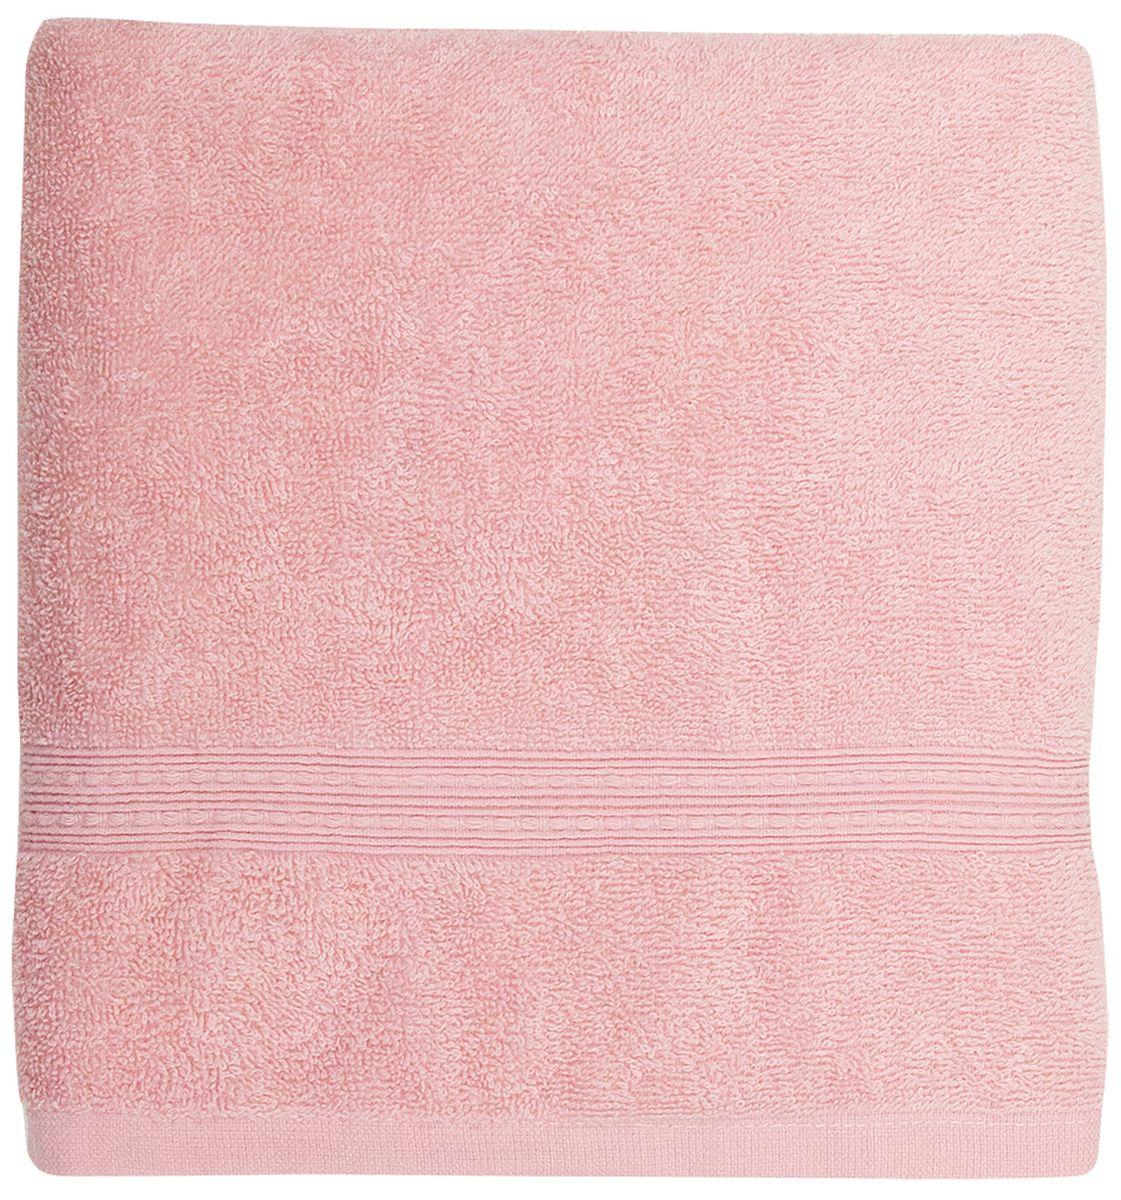 Полотенце банное Bonita Classic, махровое, цвет: роза, 50 x 90 см531-105Полотенце банное 50*90 Bonita Classic, махровое